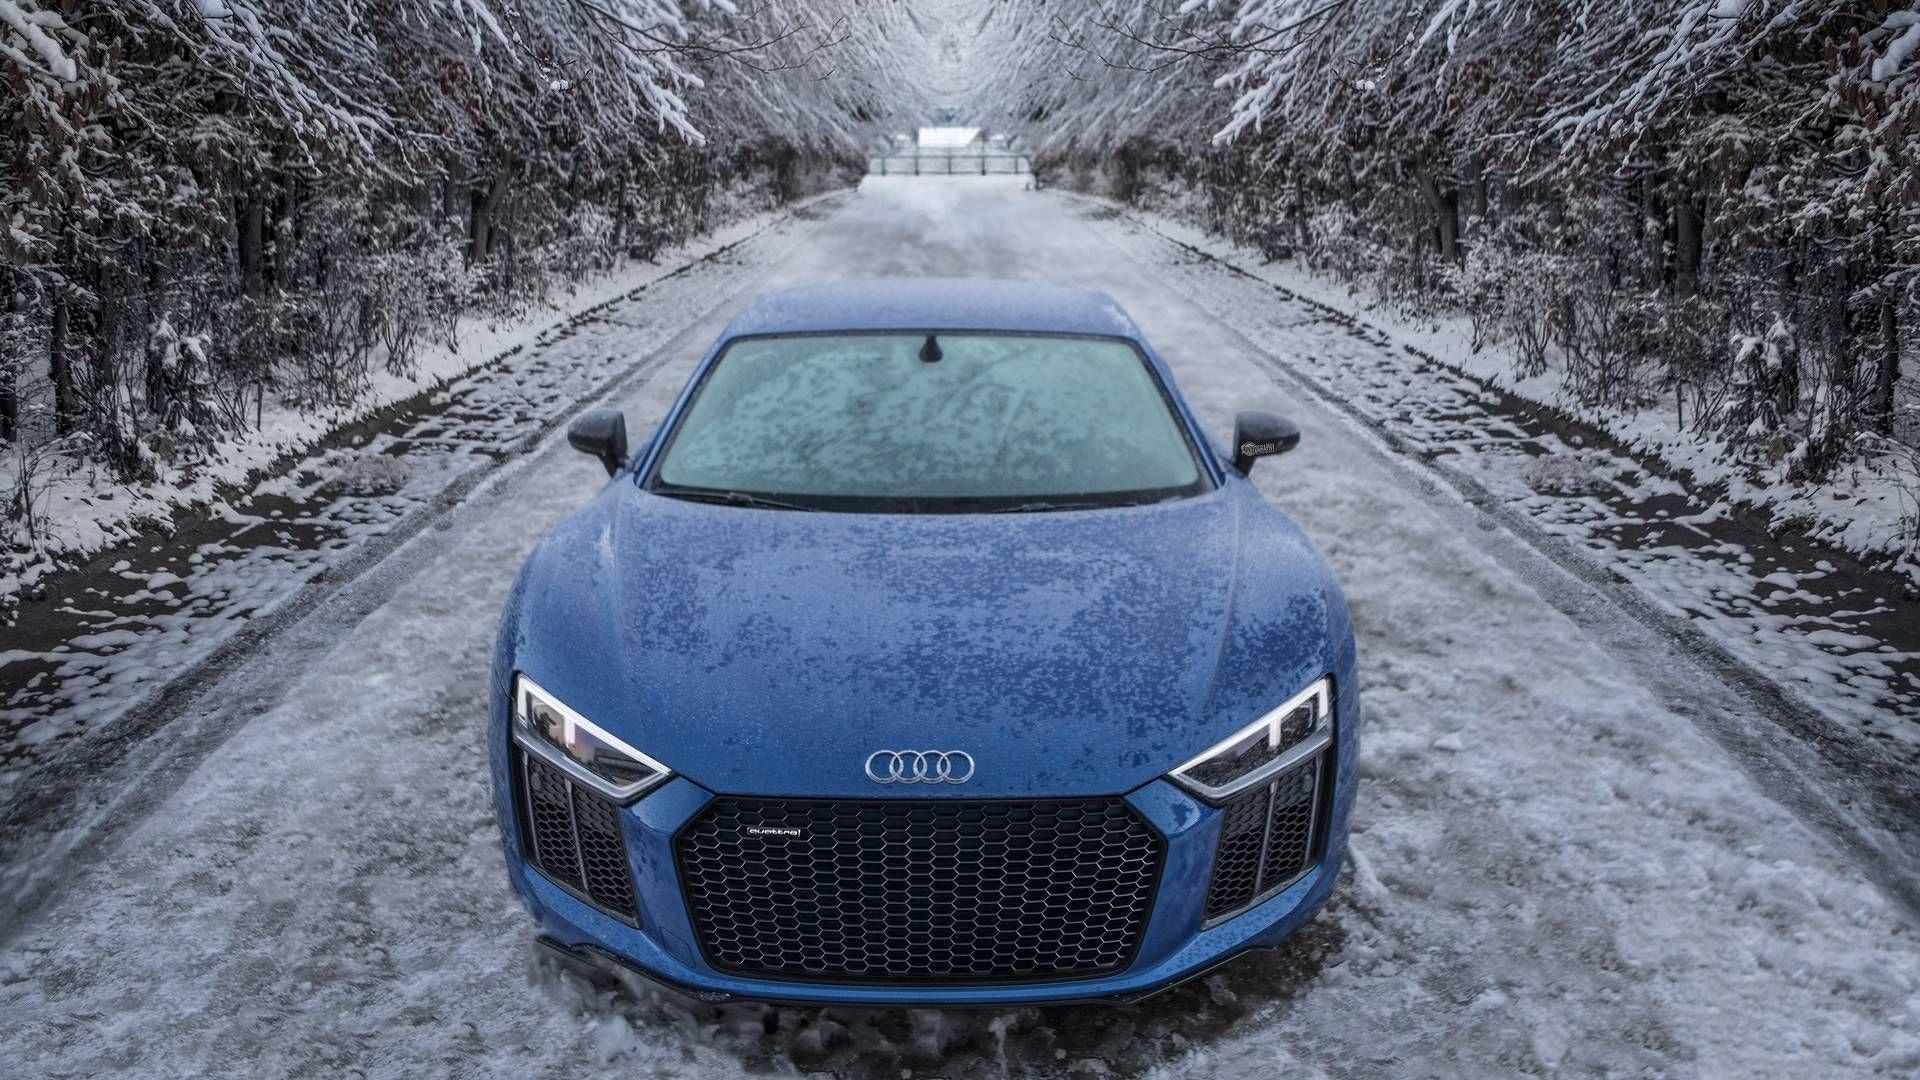 R8 In The Snow Audi R8 Snow Fun Sportscars Supercar Fastcars Drive Audi Cars Audi Rs7 Black Audi